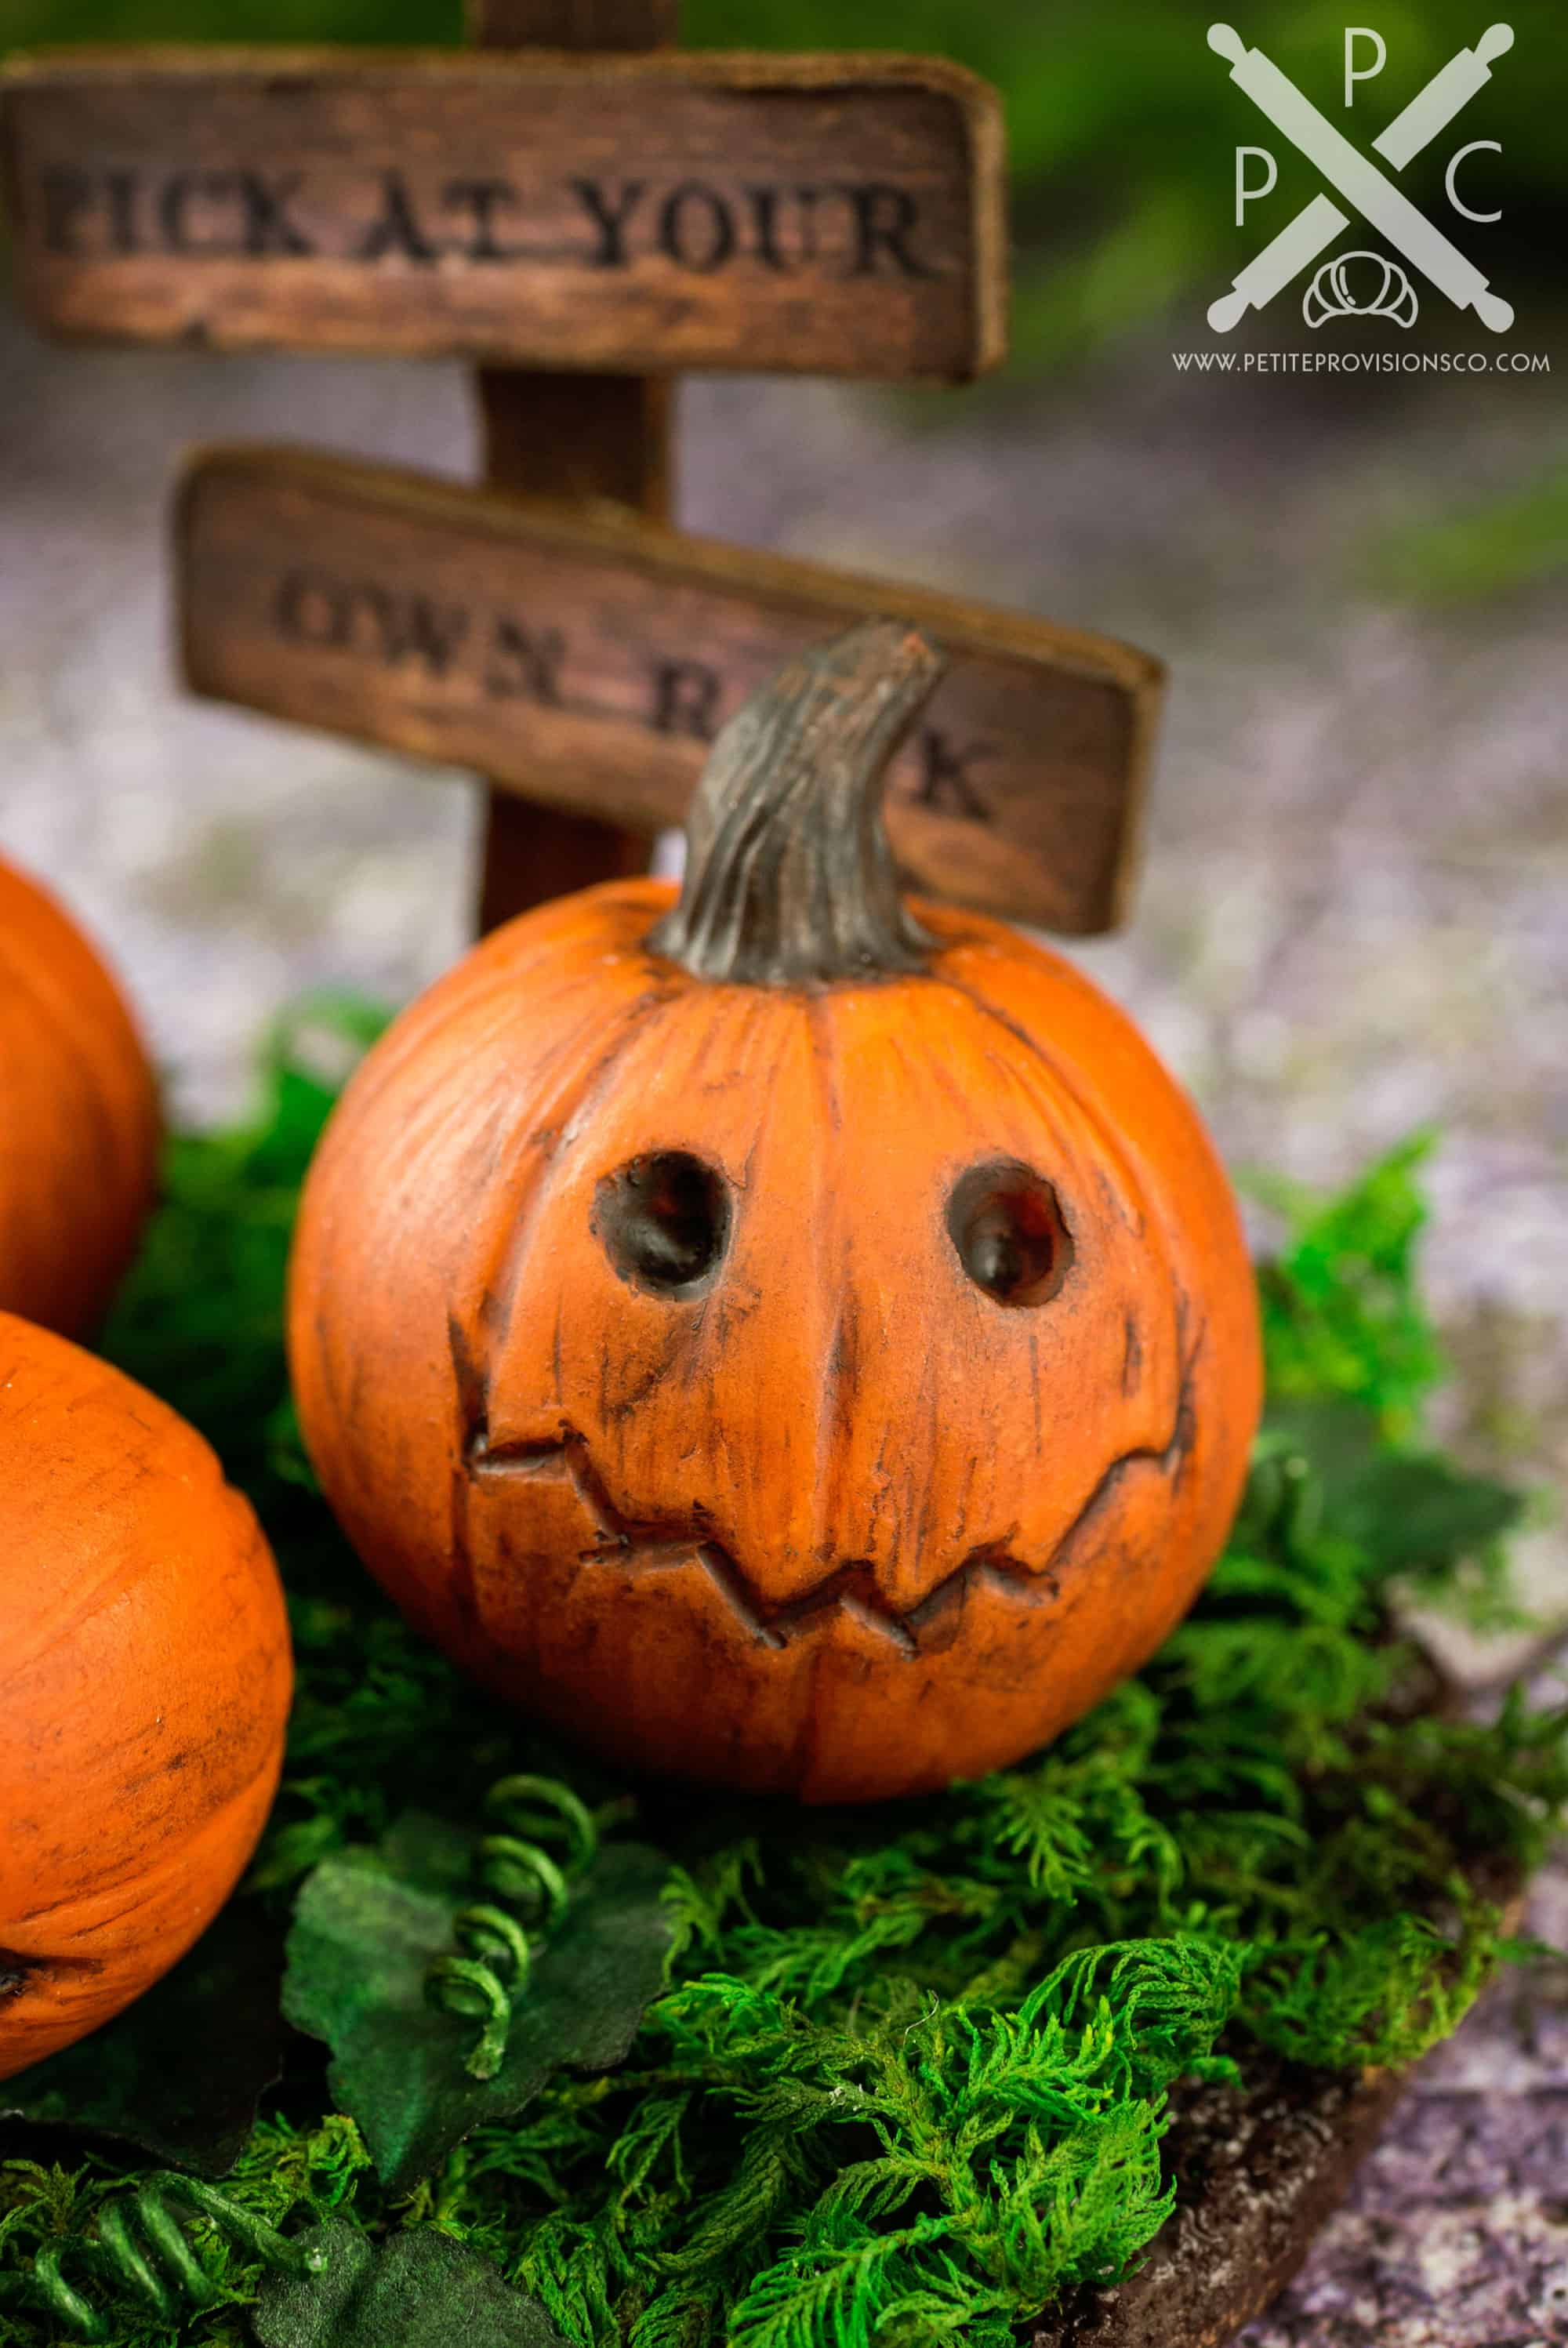 Dollhouse Miniature Halloween Jack-o'-lantern Pumpkin ...